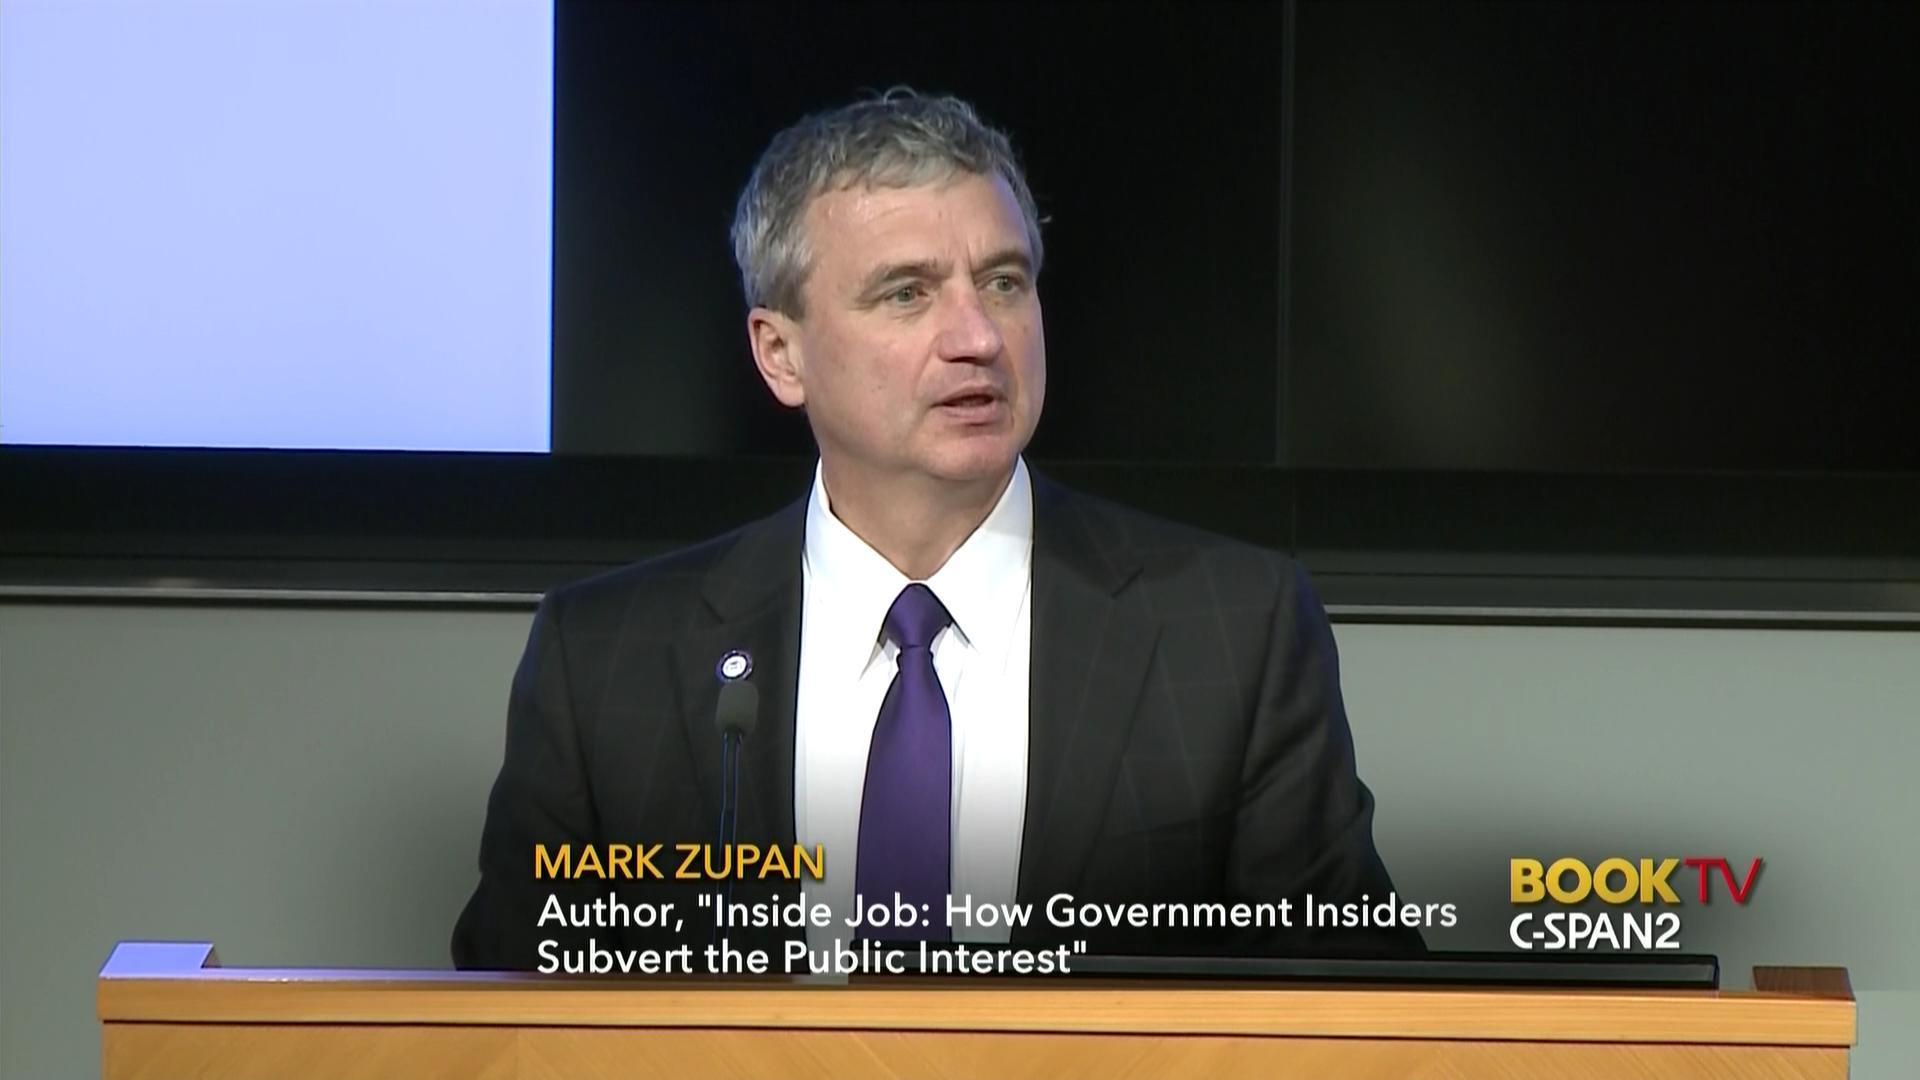 Mark Zupan Discusses Inside Job, Mar 30 2017   Video   C-SPAN.org